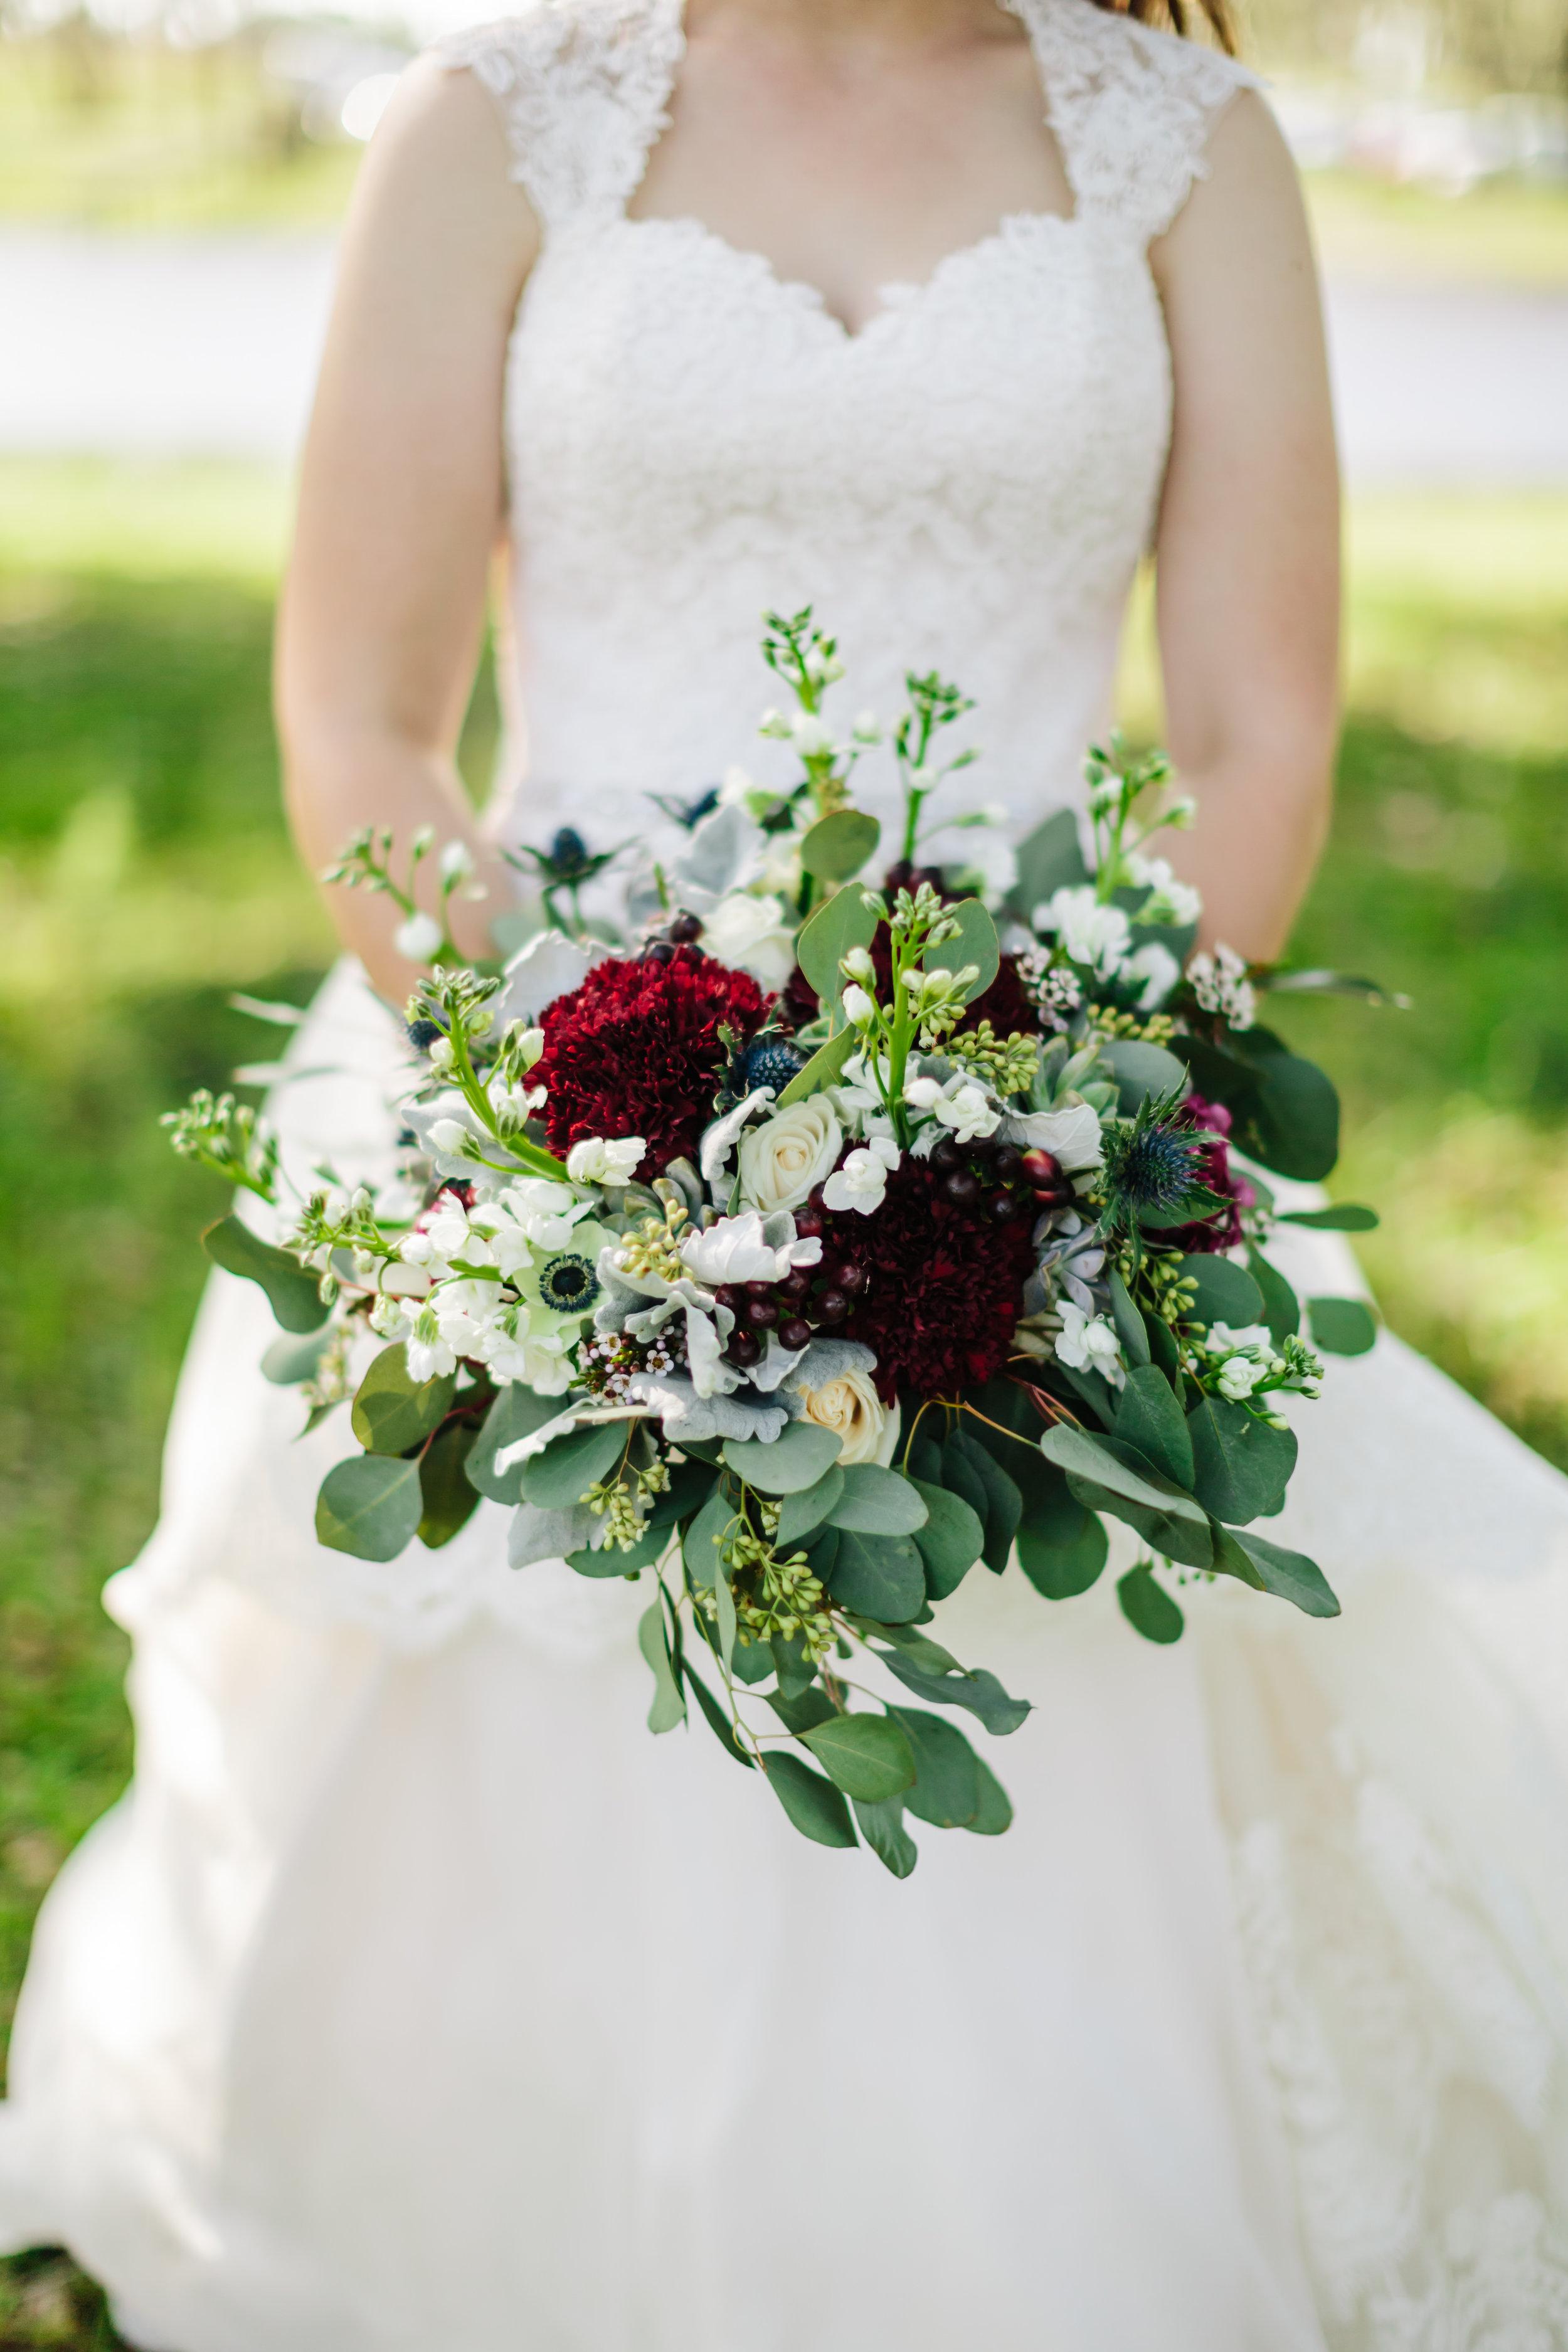 2018.04.14 Zak and Jamisyn Unrue Black Willow Barn Wedding Finals-589.jpg